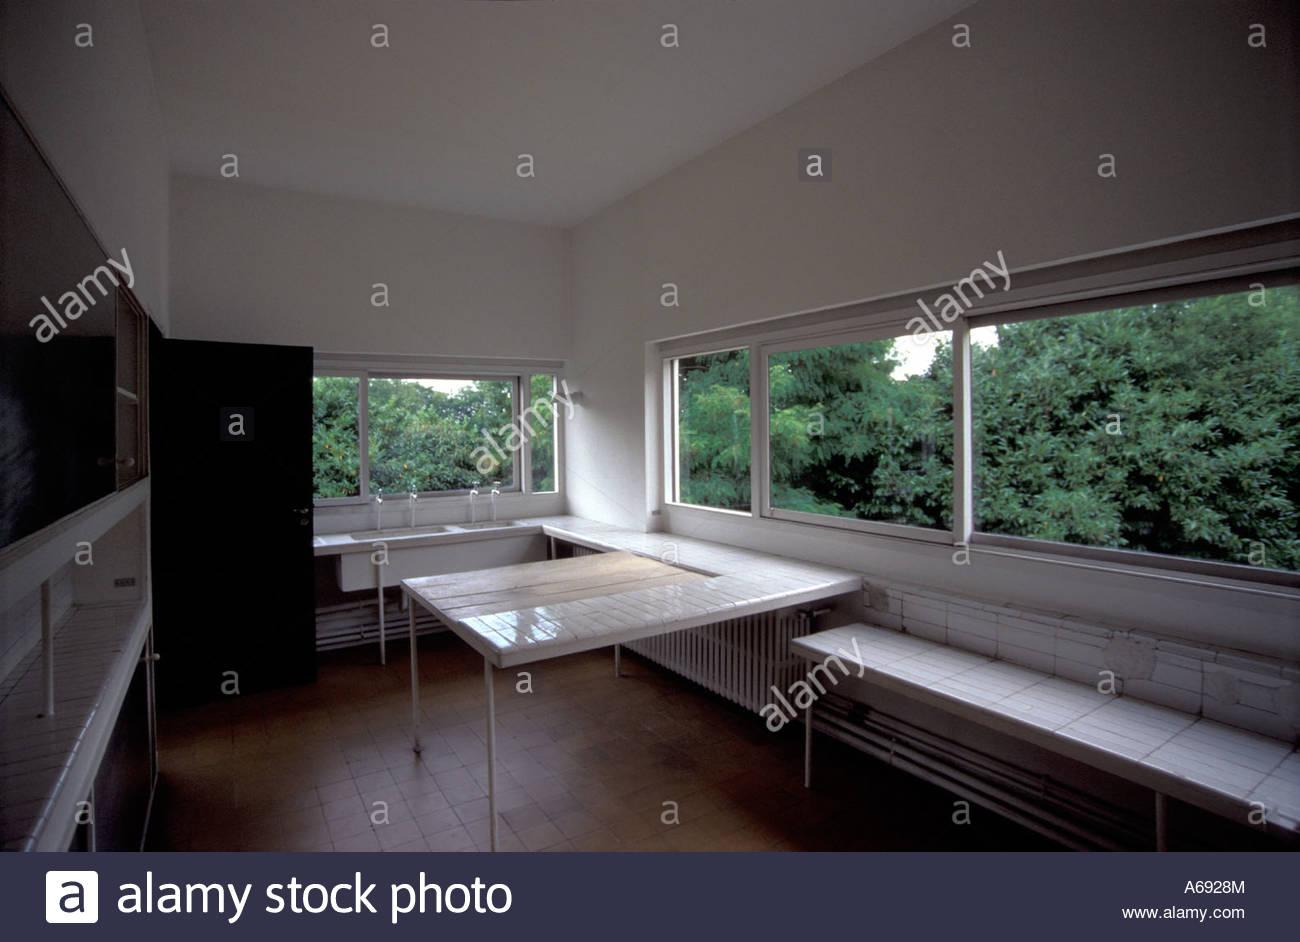 Le corbusier villa savoye interior - Kitchen Of Villa Savoye In Poissy Near Paris France By Swiss Architect Le Corbusier